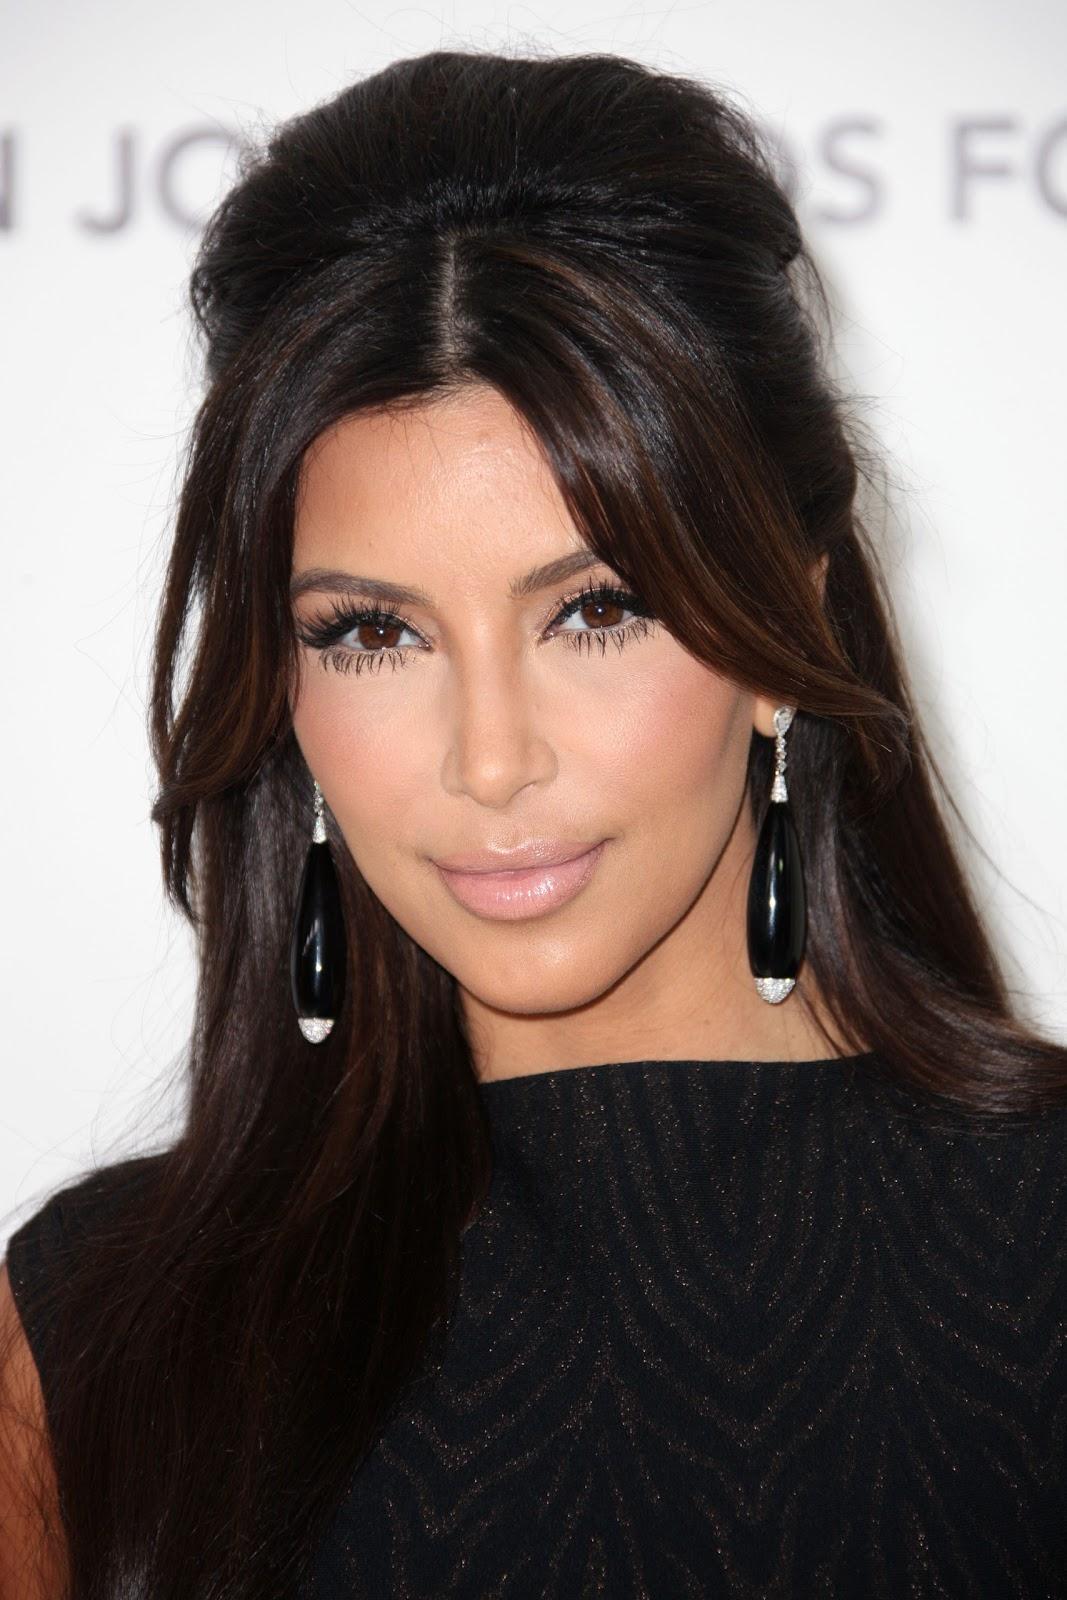 kim kardashian elton john oscar party 0229 4 Retirement Communities